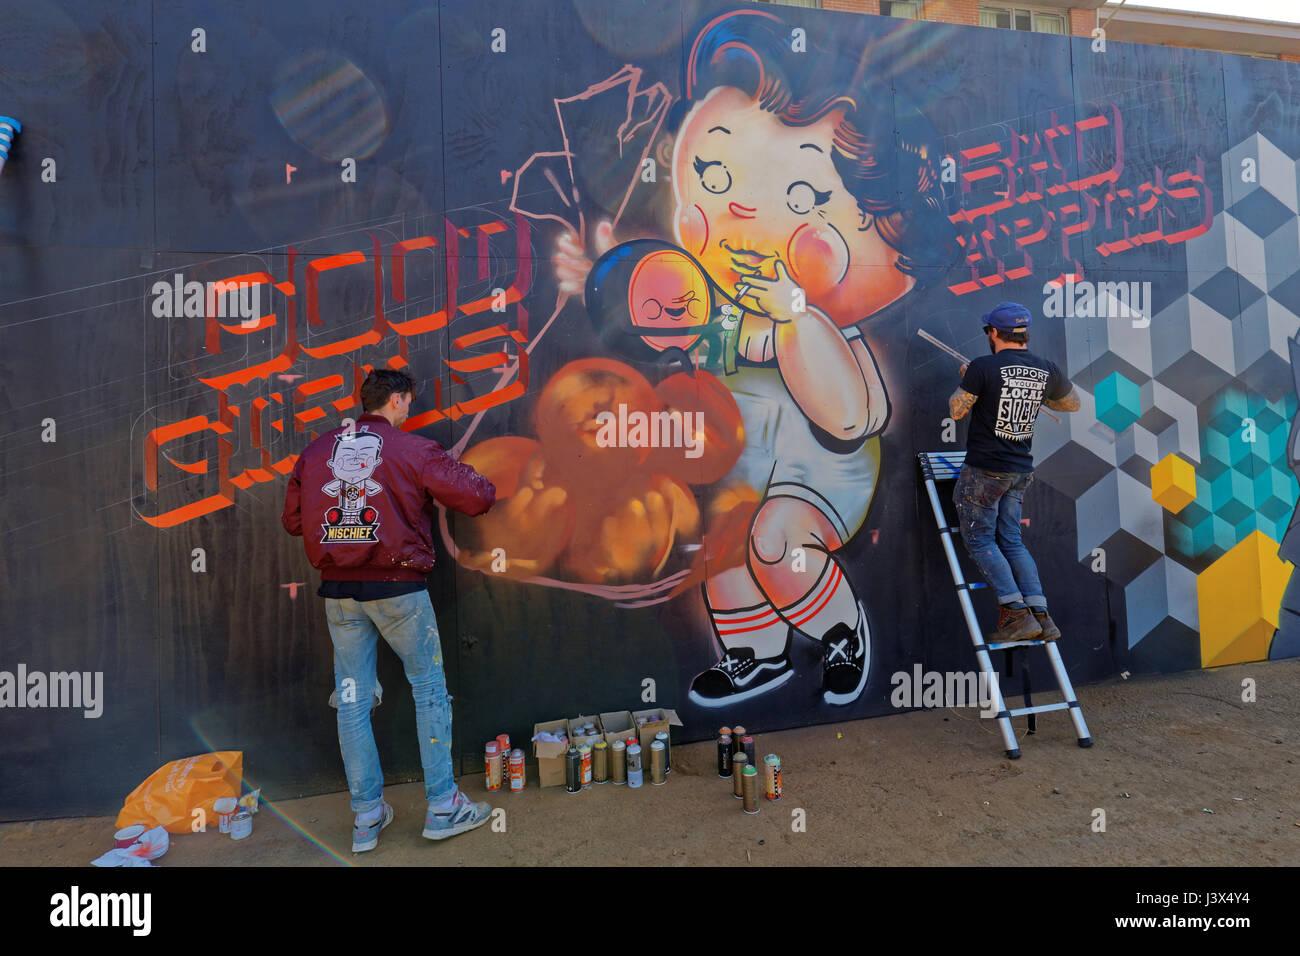 Glasgow, Scotland, UK. 7th May, 2017. 'Yard Works Festival 2017' is an International celebration of Graffiti, - Stock Image